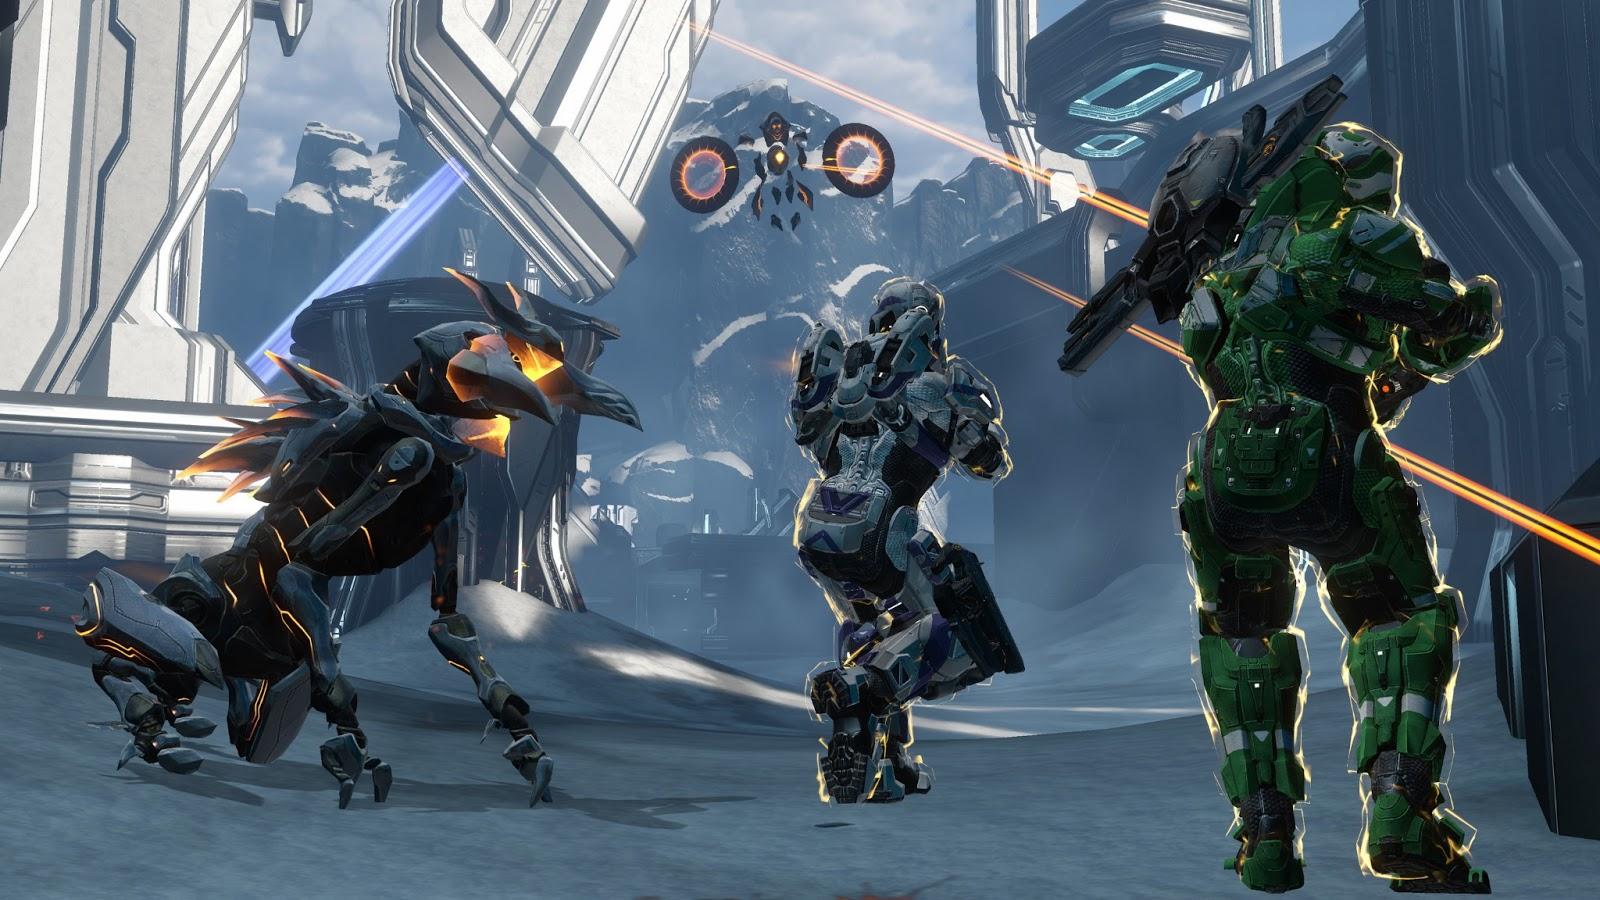 Halo 3 Screenshots, Pictures XboxAchievementscom